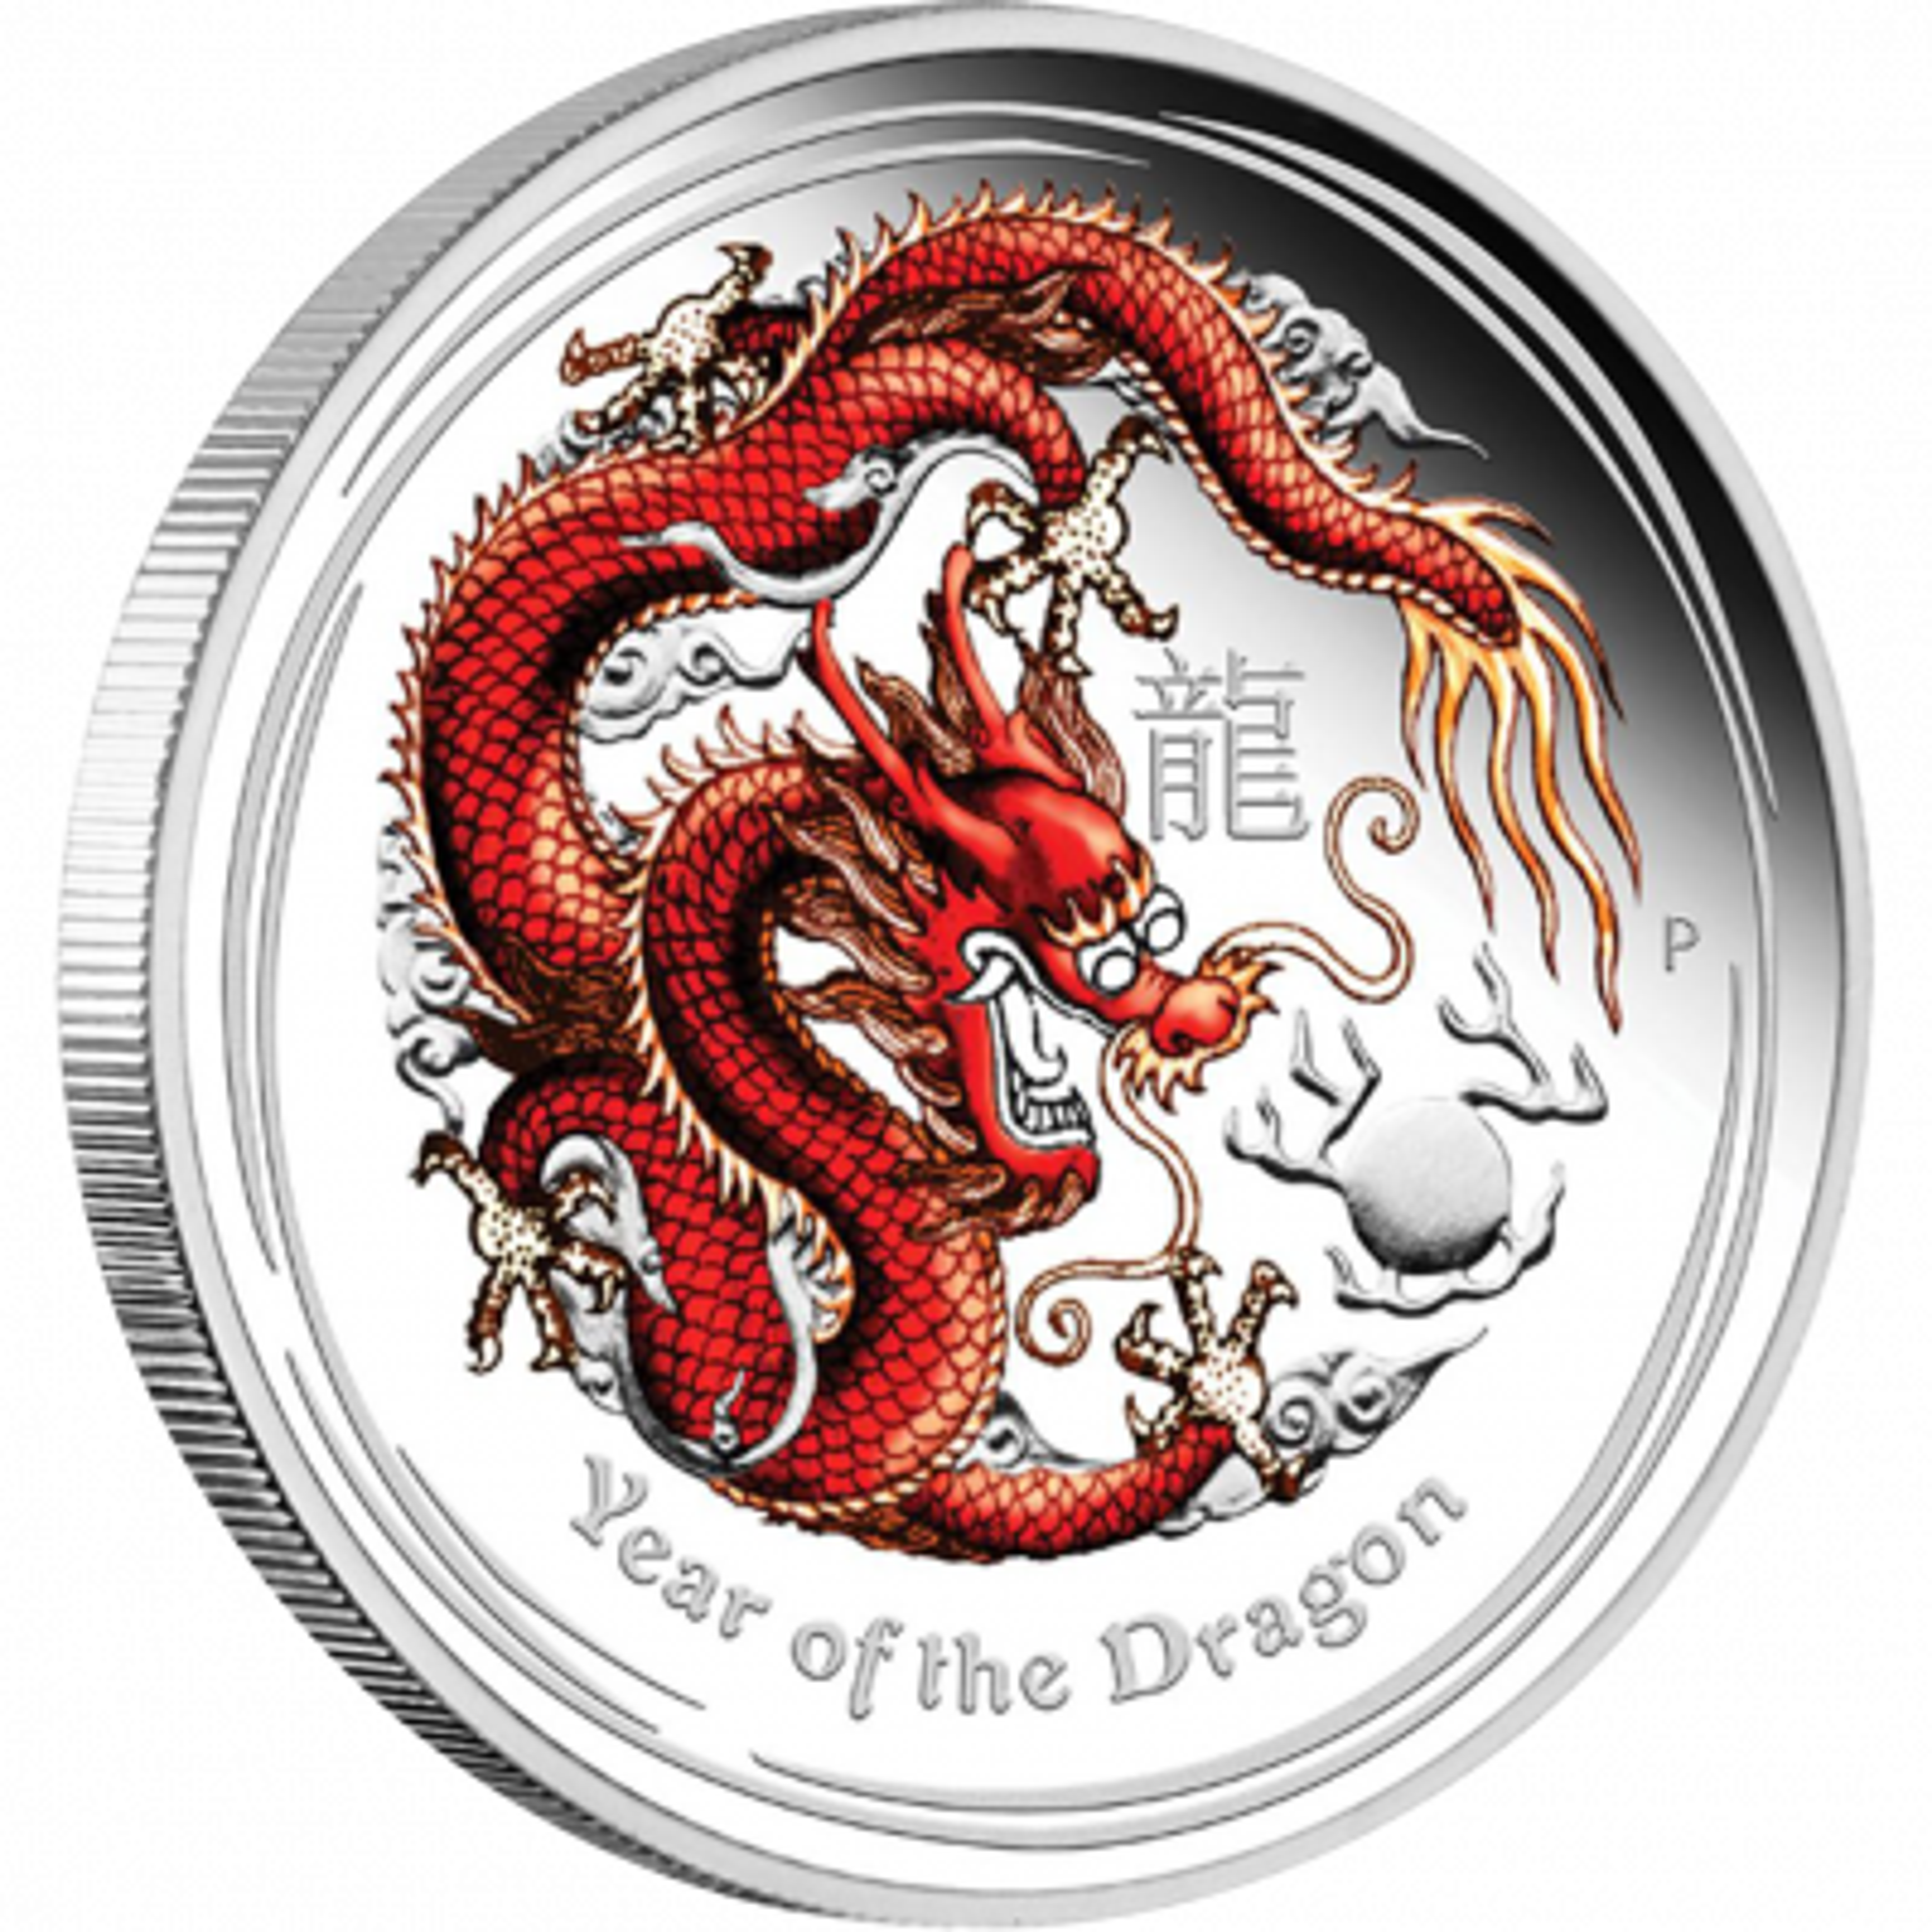 Lunar silver kilo coin 2012 Year of the Dragon in color